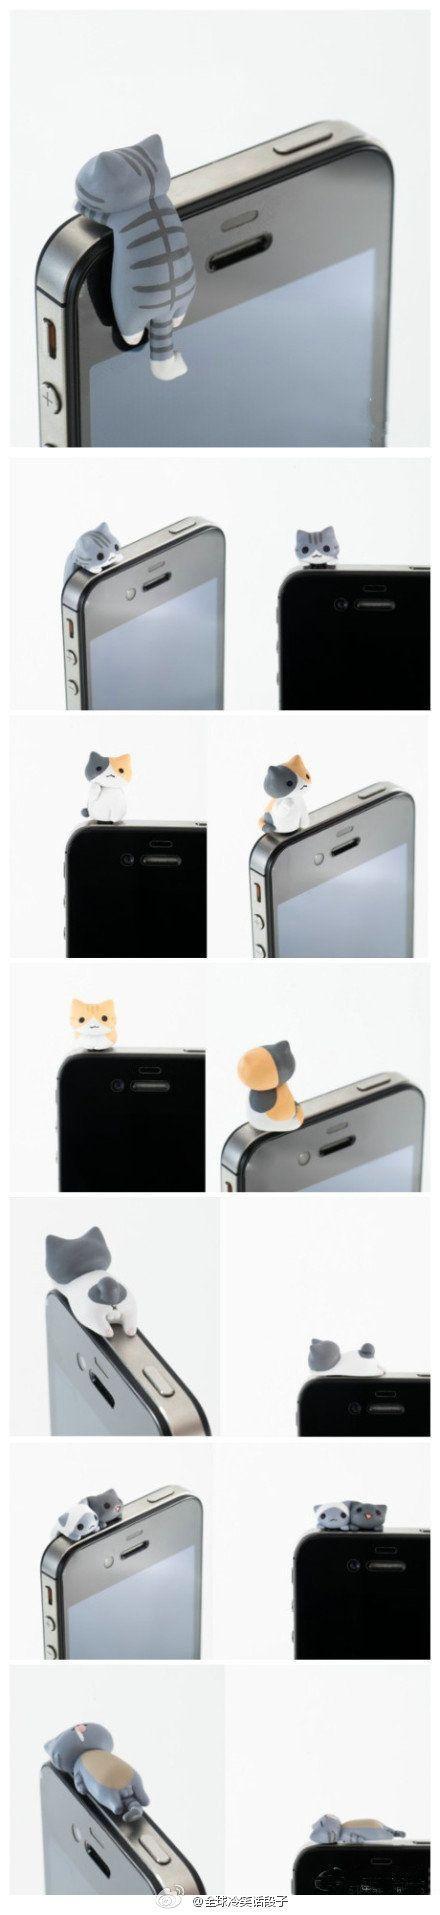 iCat Ear Plug For iPhone  Design das mir gefällt